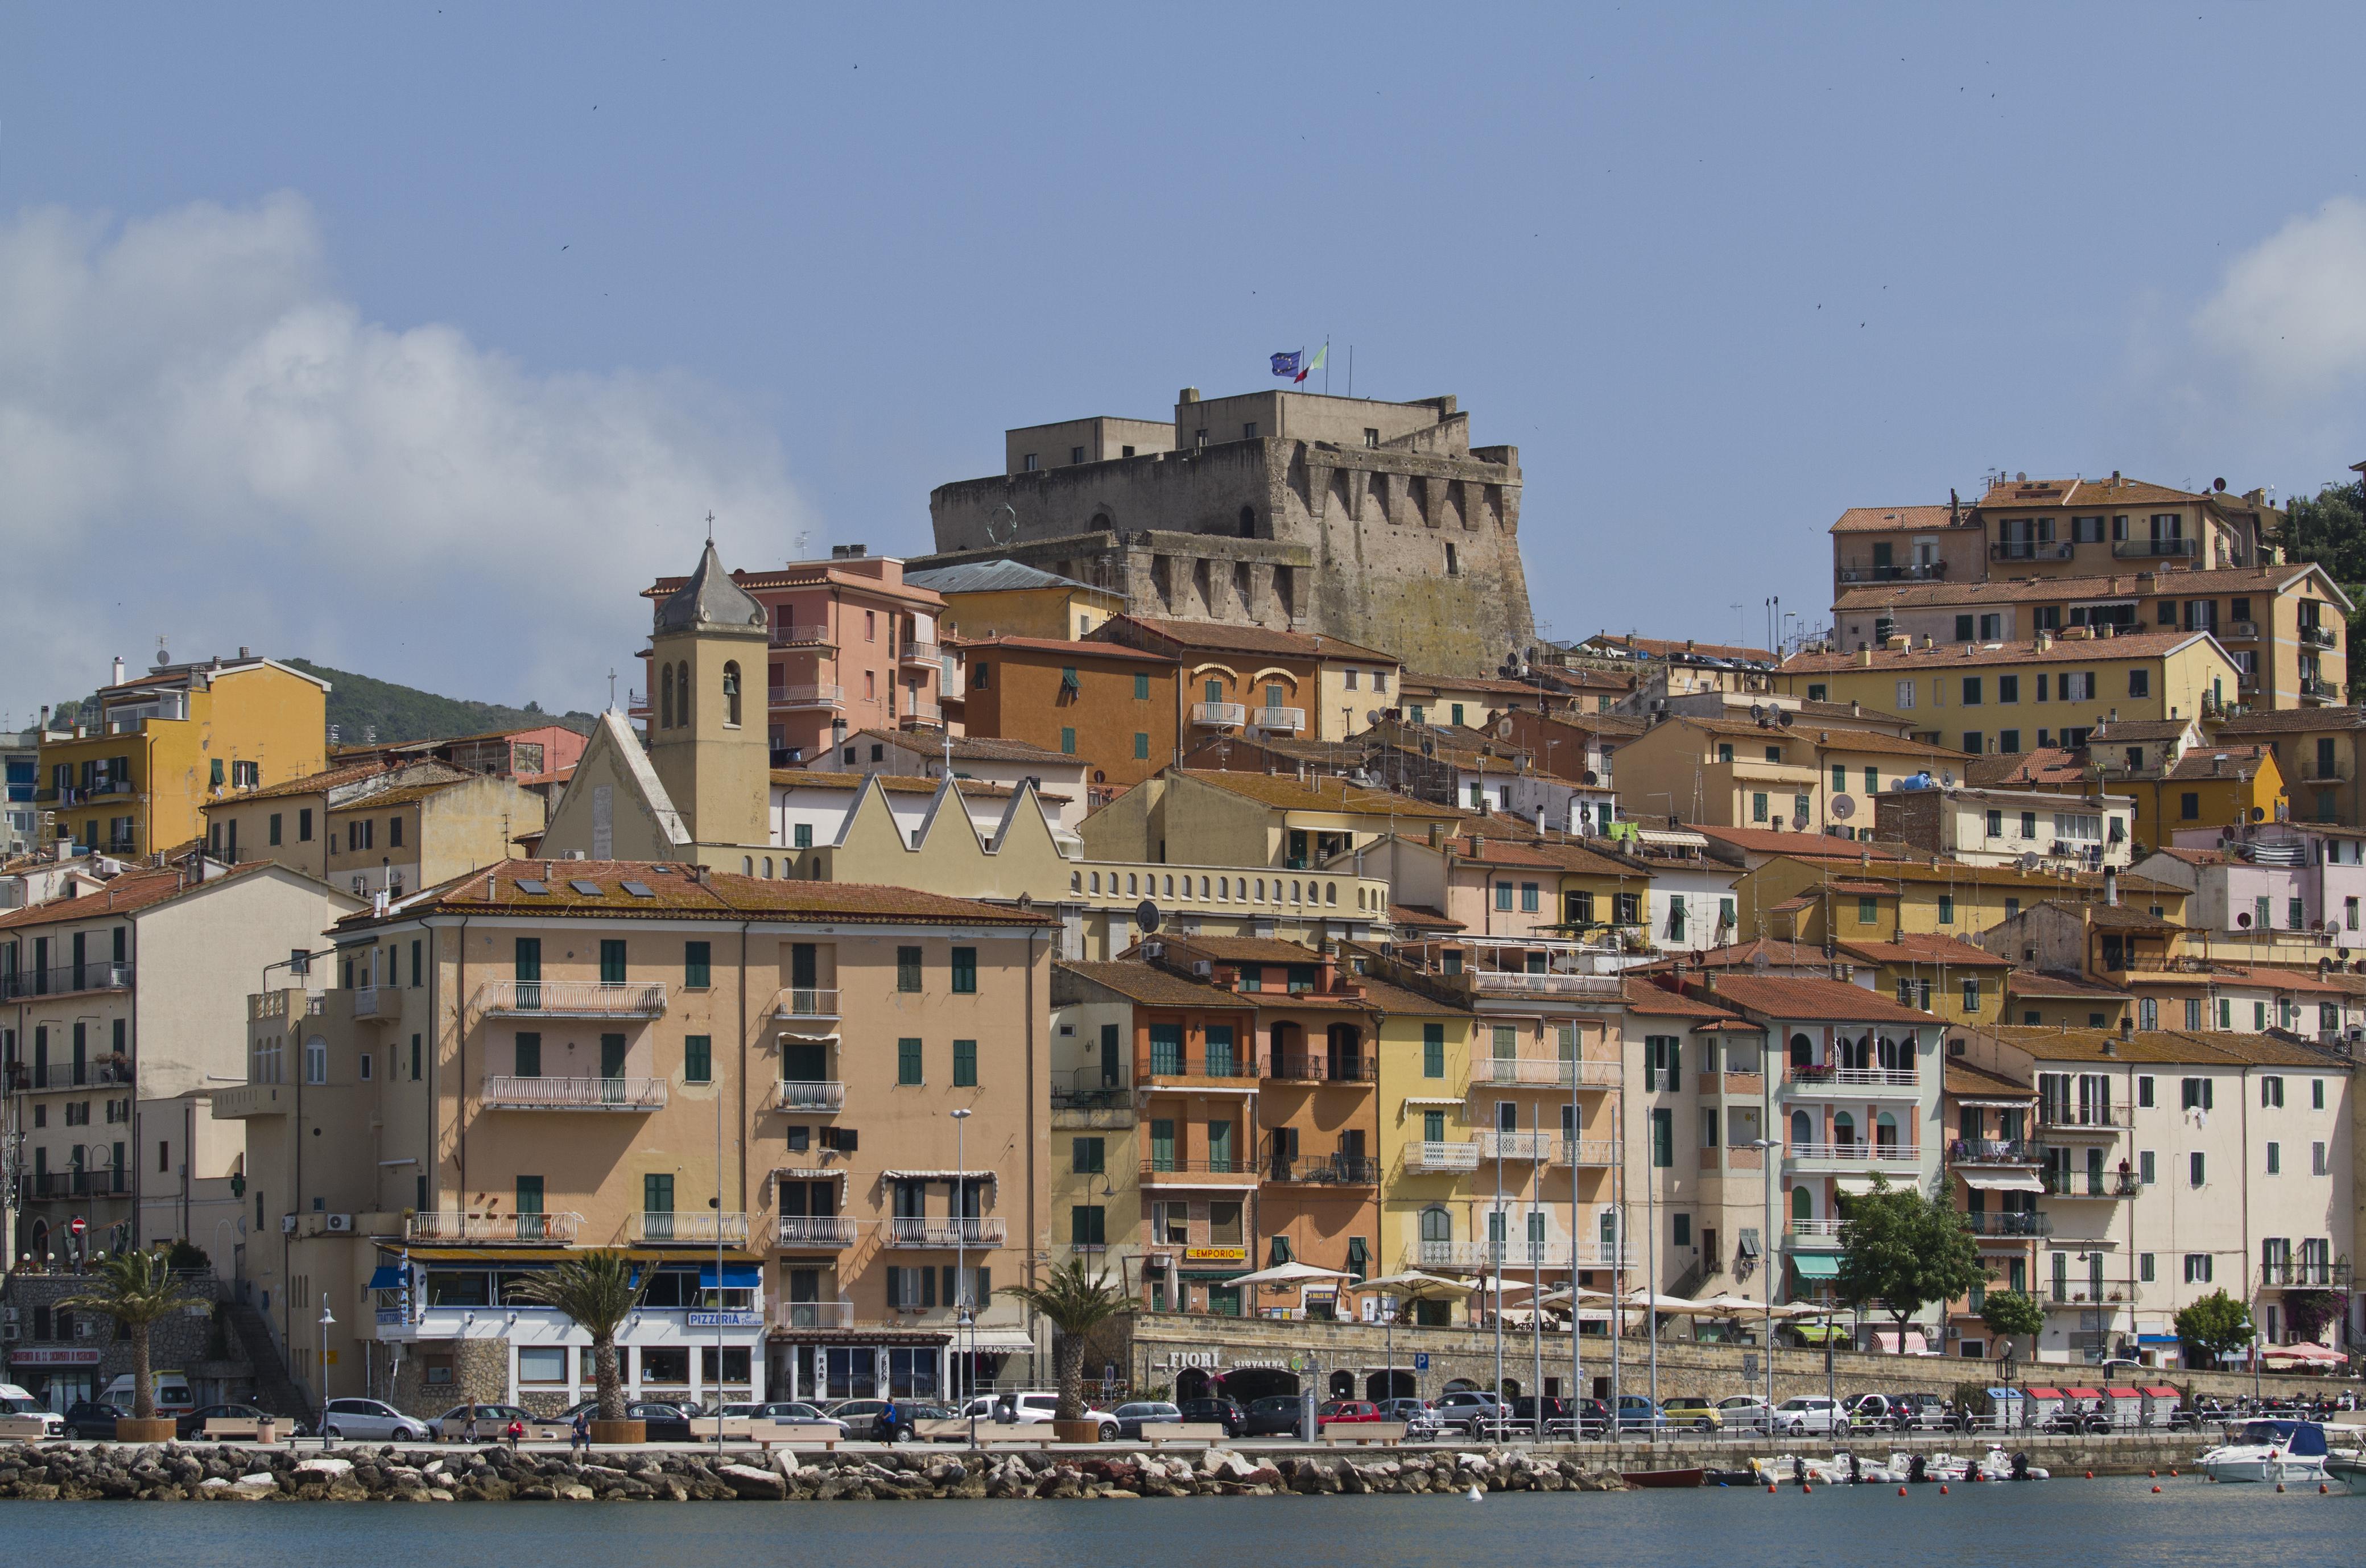 Porto Santo Stefano, Porto Santo Stefano GR, Tuscany, Italy